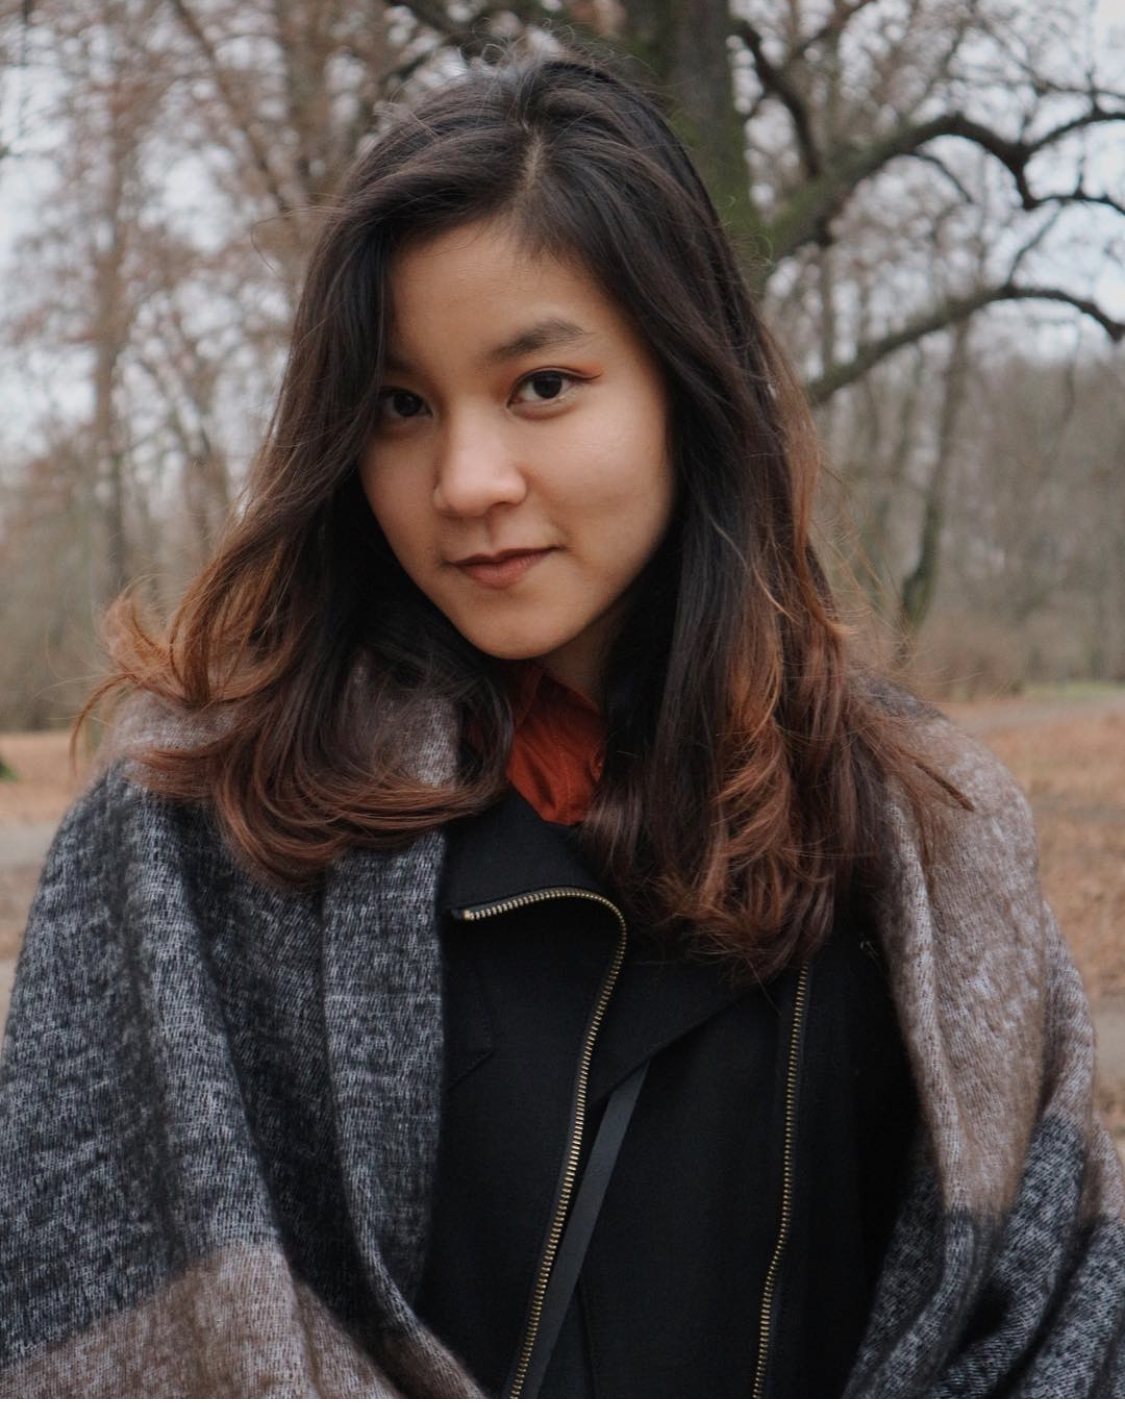 Image of Ming Nguyen - International Hospitality Management (BSc) student